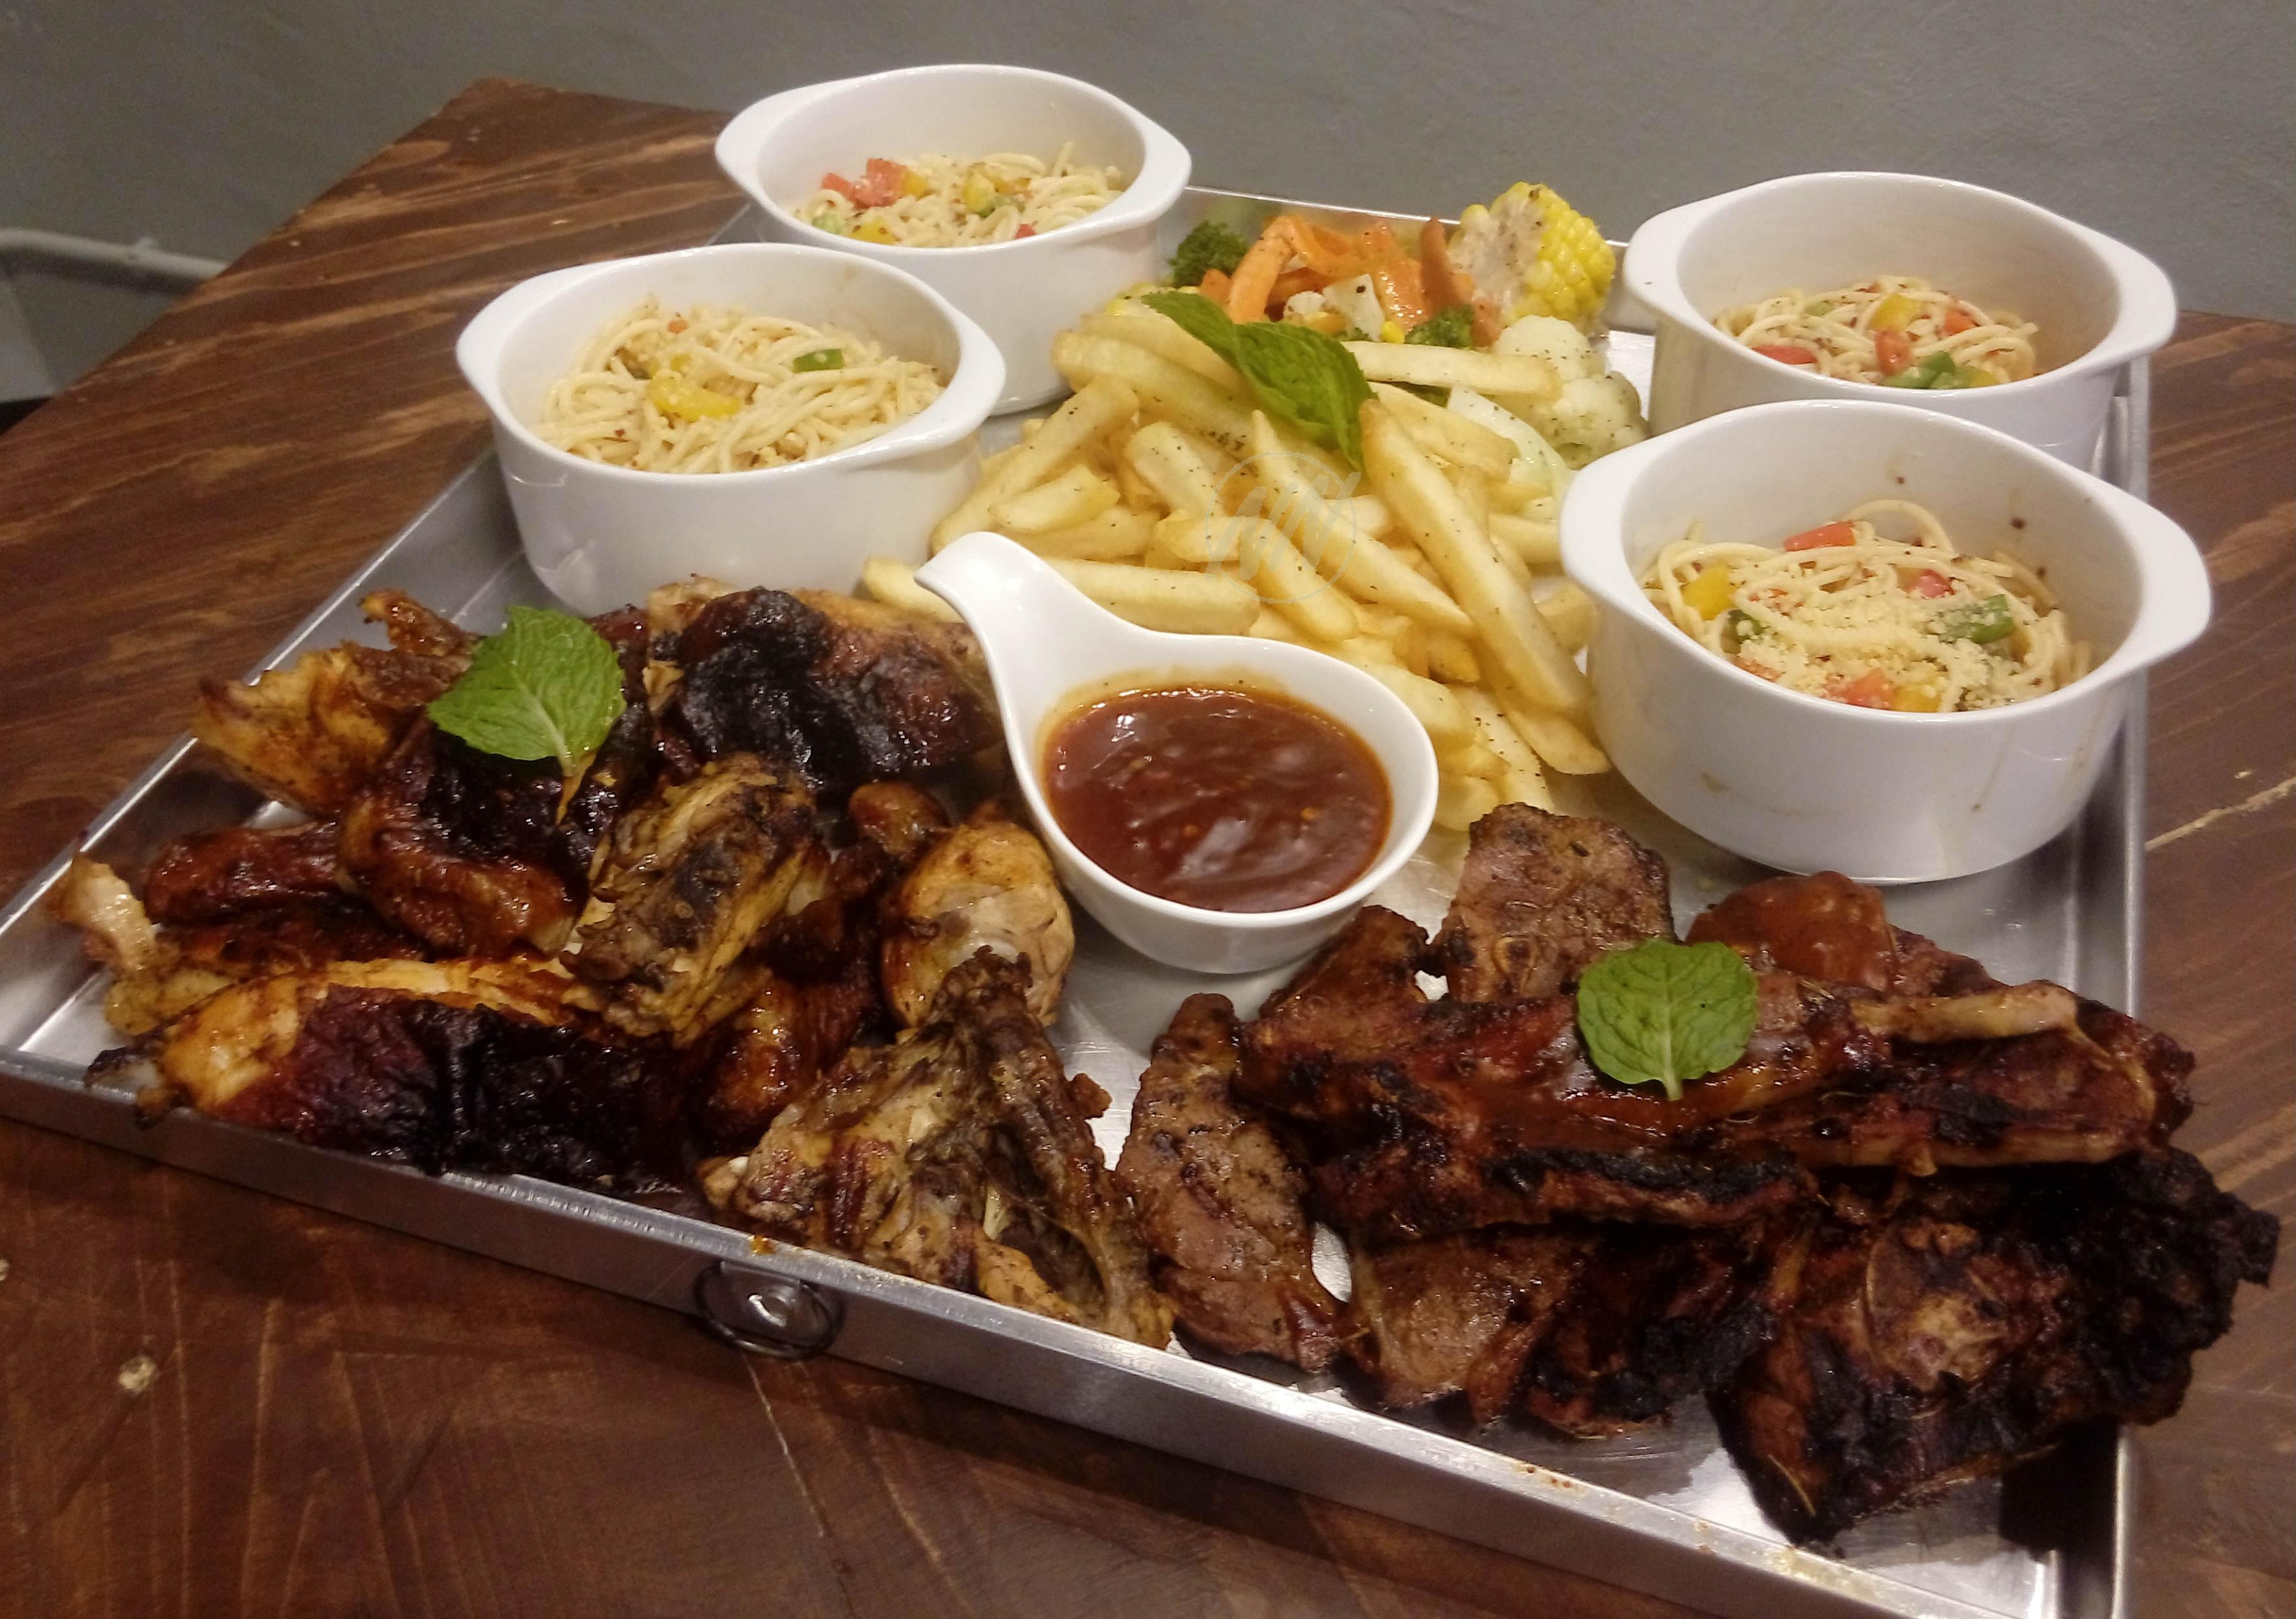 Meat Platter - RM99.00